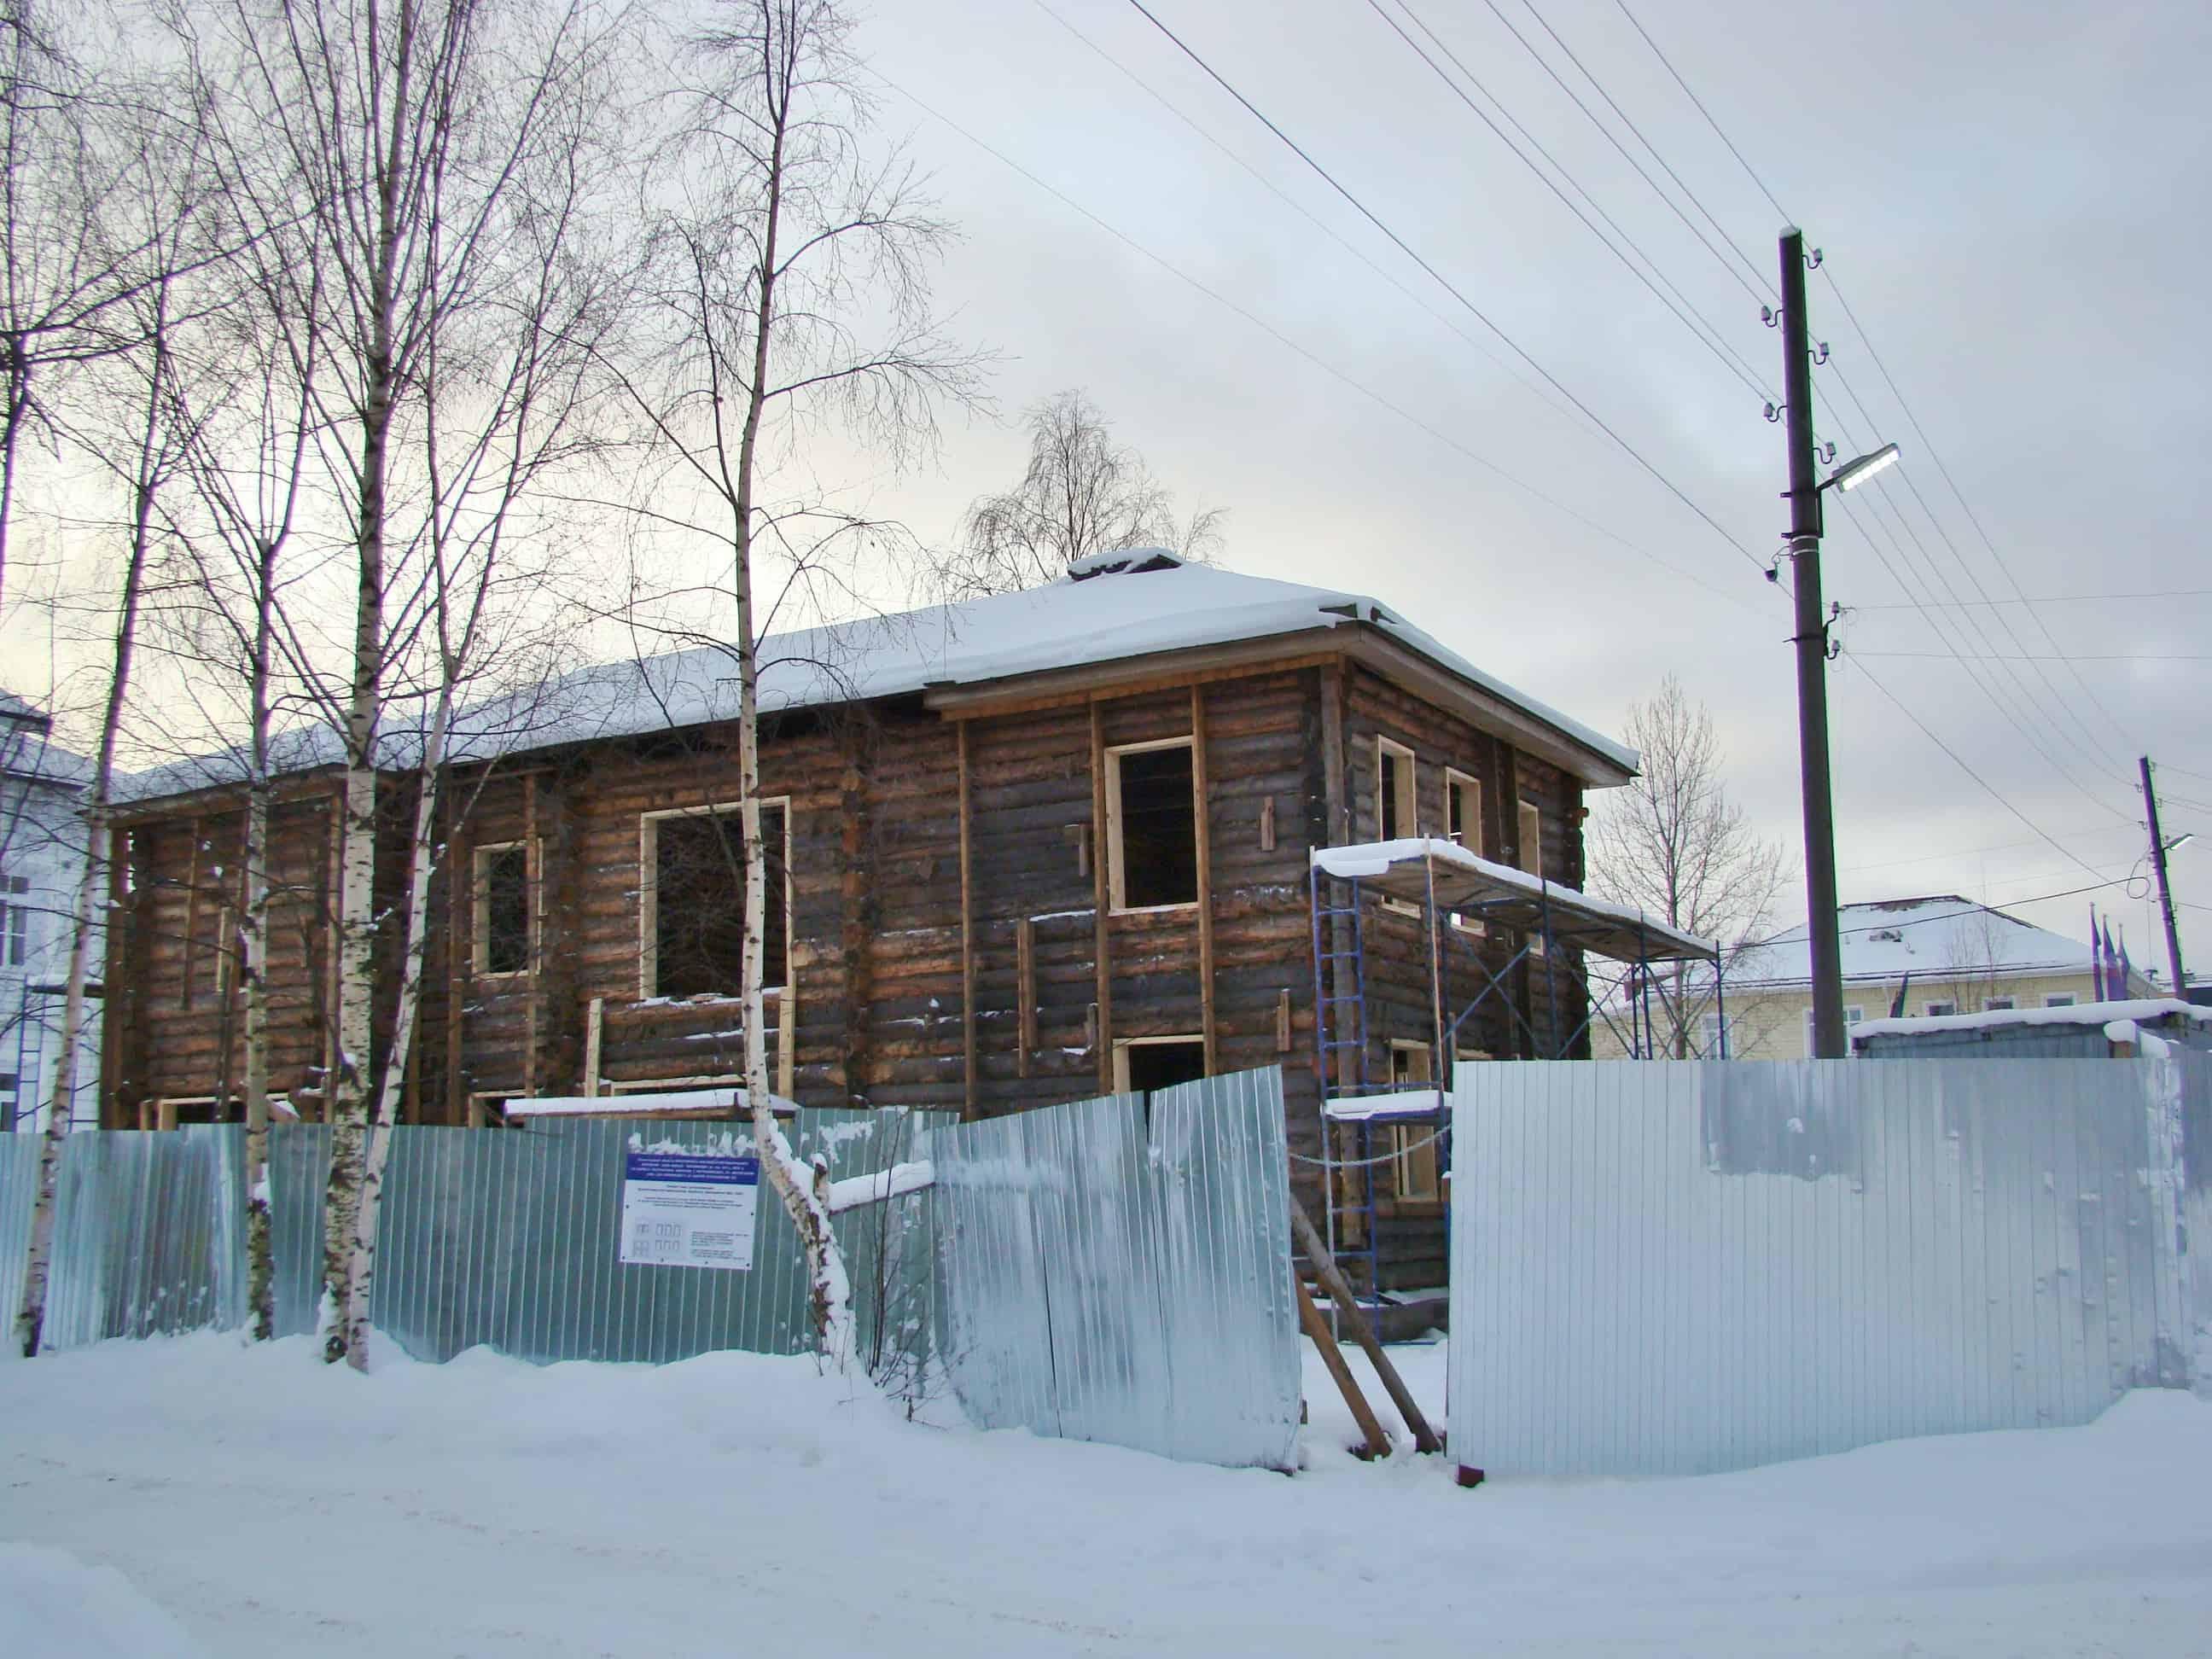 Дом Богданова в Петрозаводске 08.01.2019